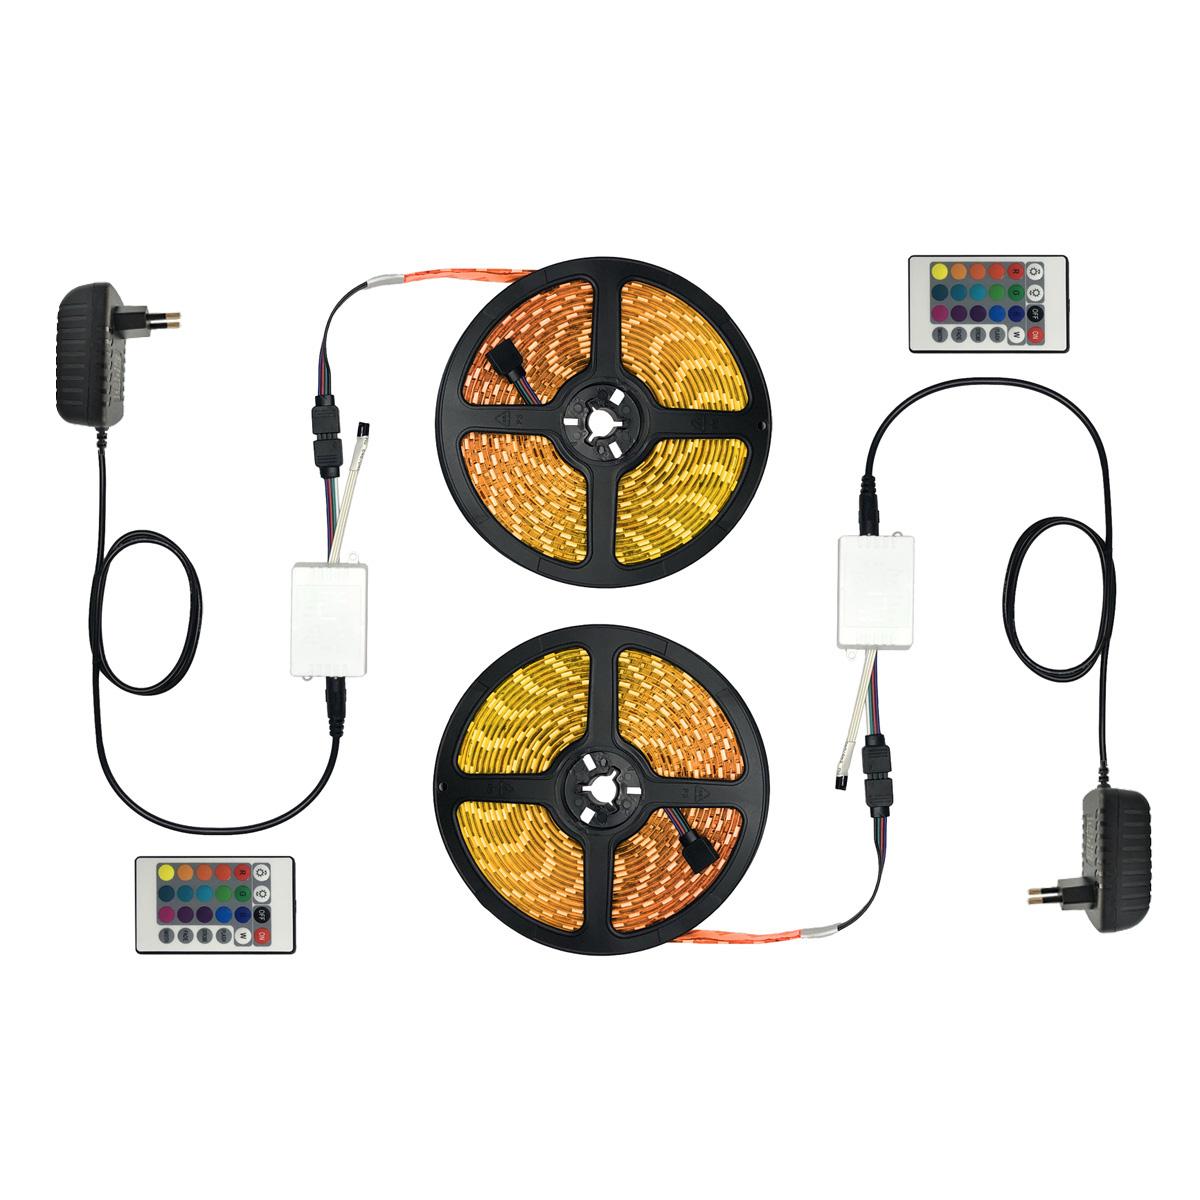 Kit Fita LED RGB 5050 10m com Controle Remoto e Fontes